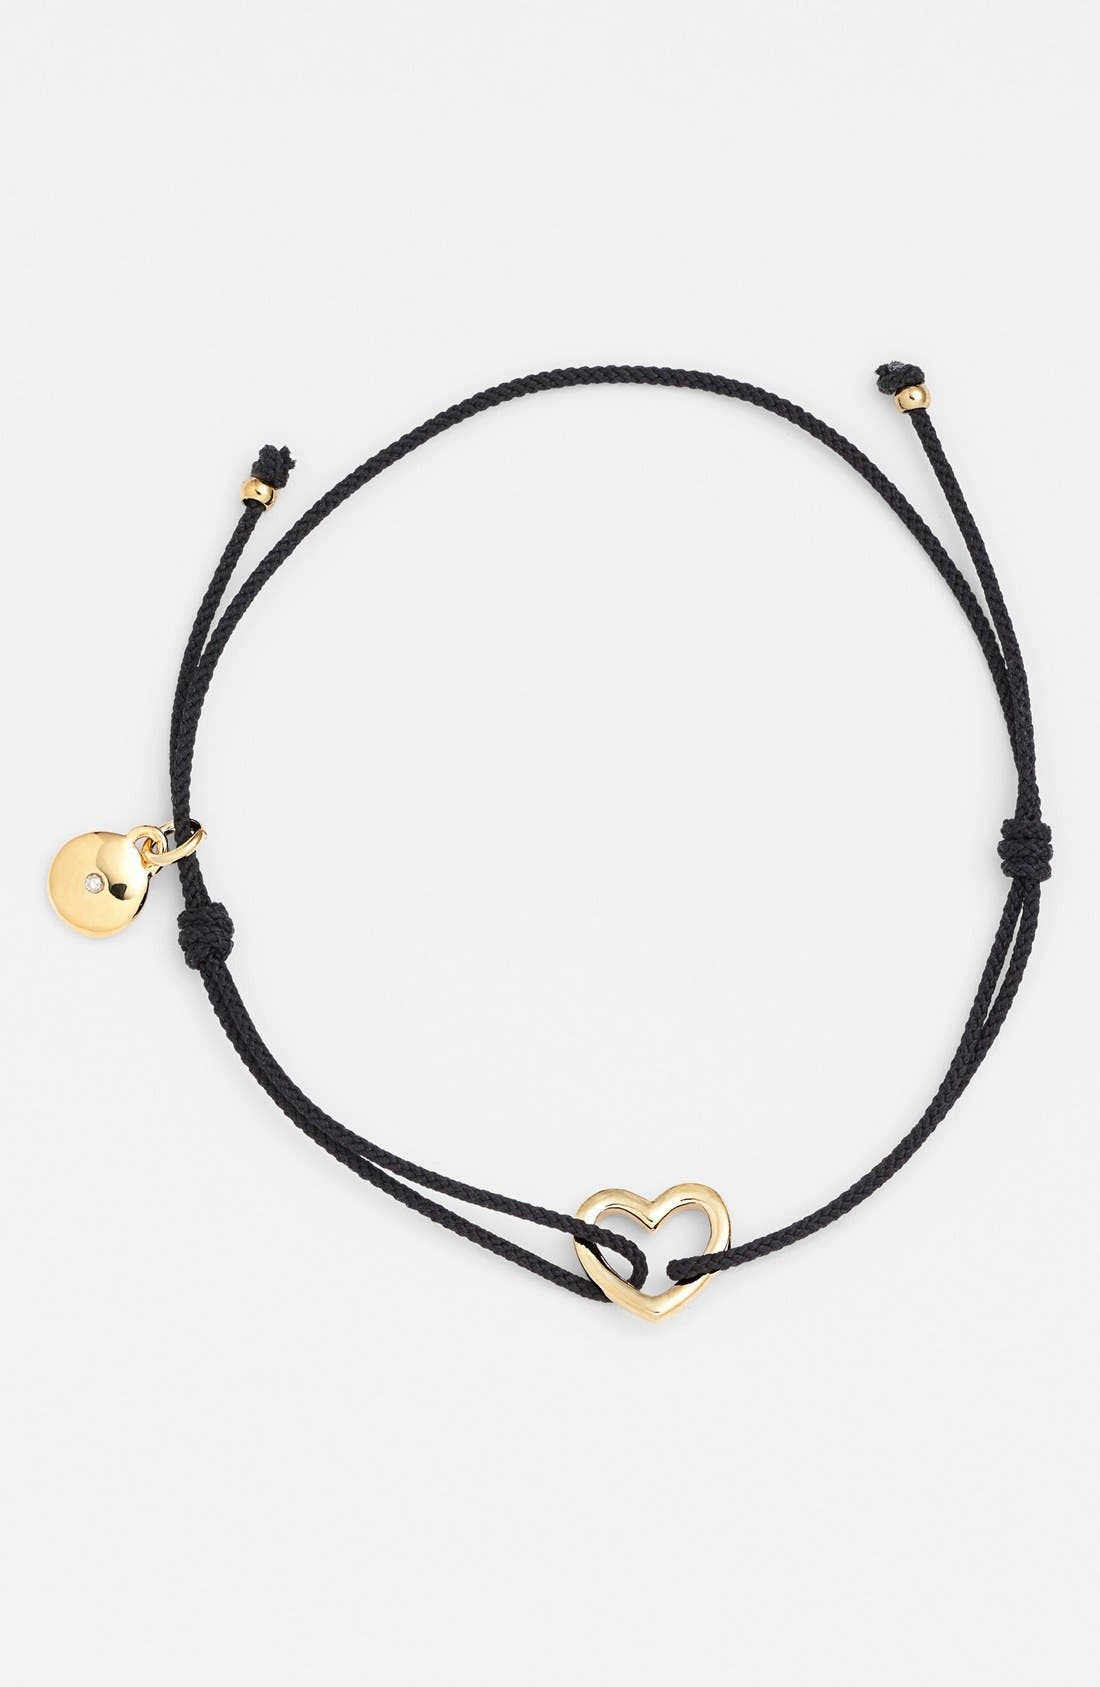 Alternate Image 1 Selected - MARC BY MARC JACOBS Heart Station Friendship Bracelet